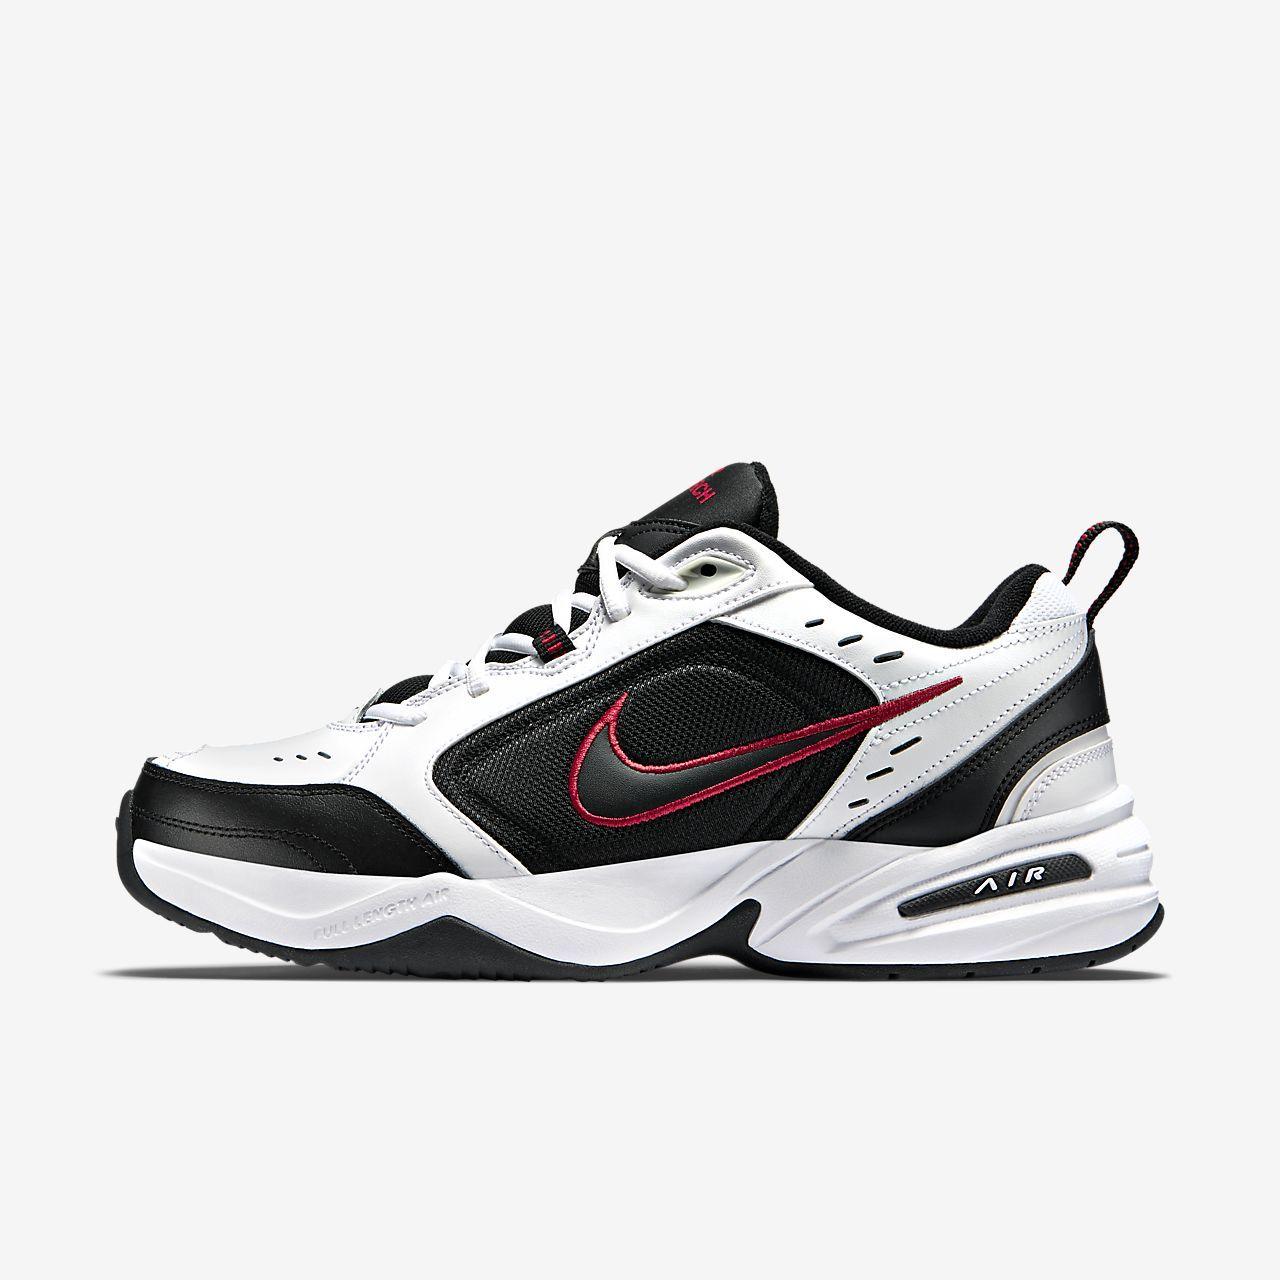 Mens Nike Air Monarch IV X Wide White Running Shoes | KAUX